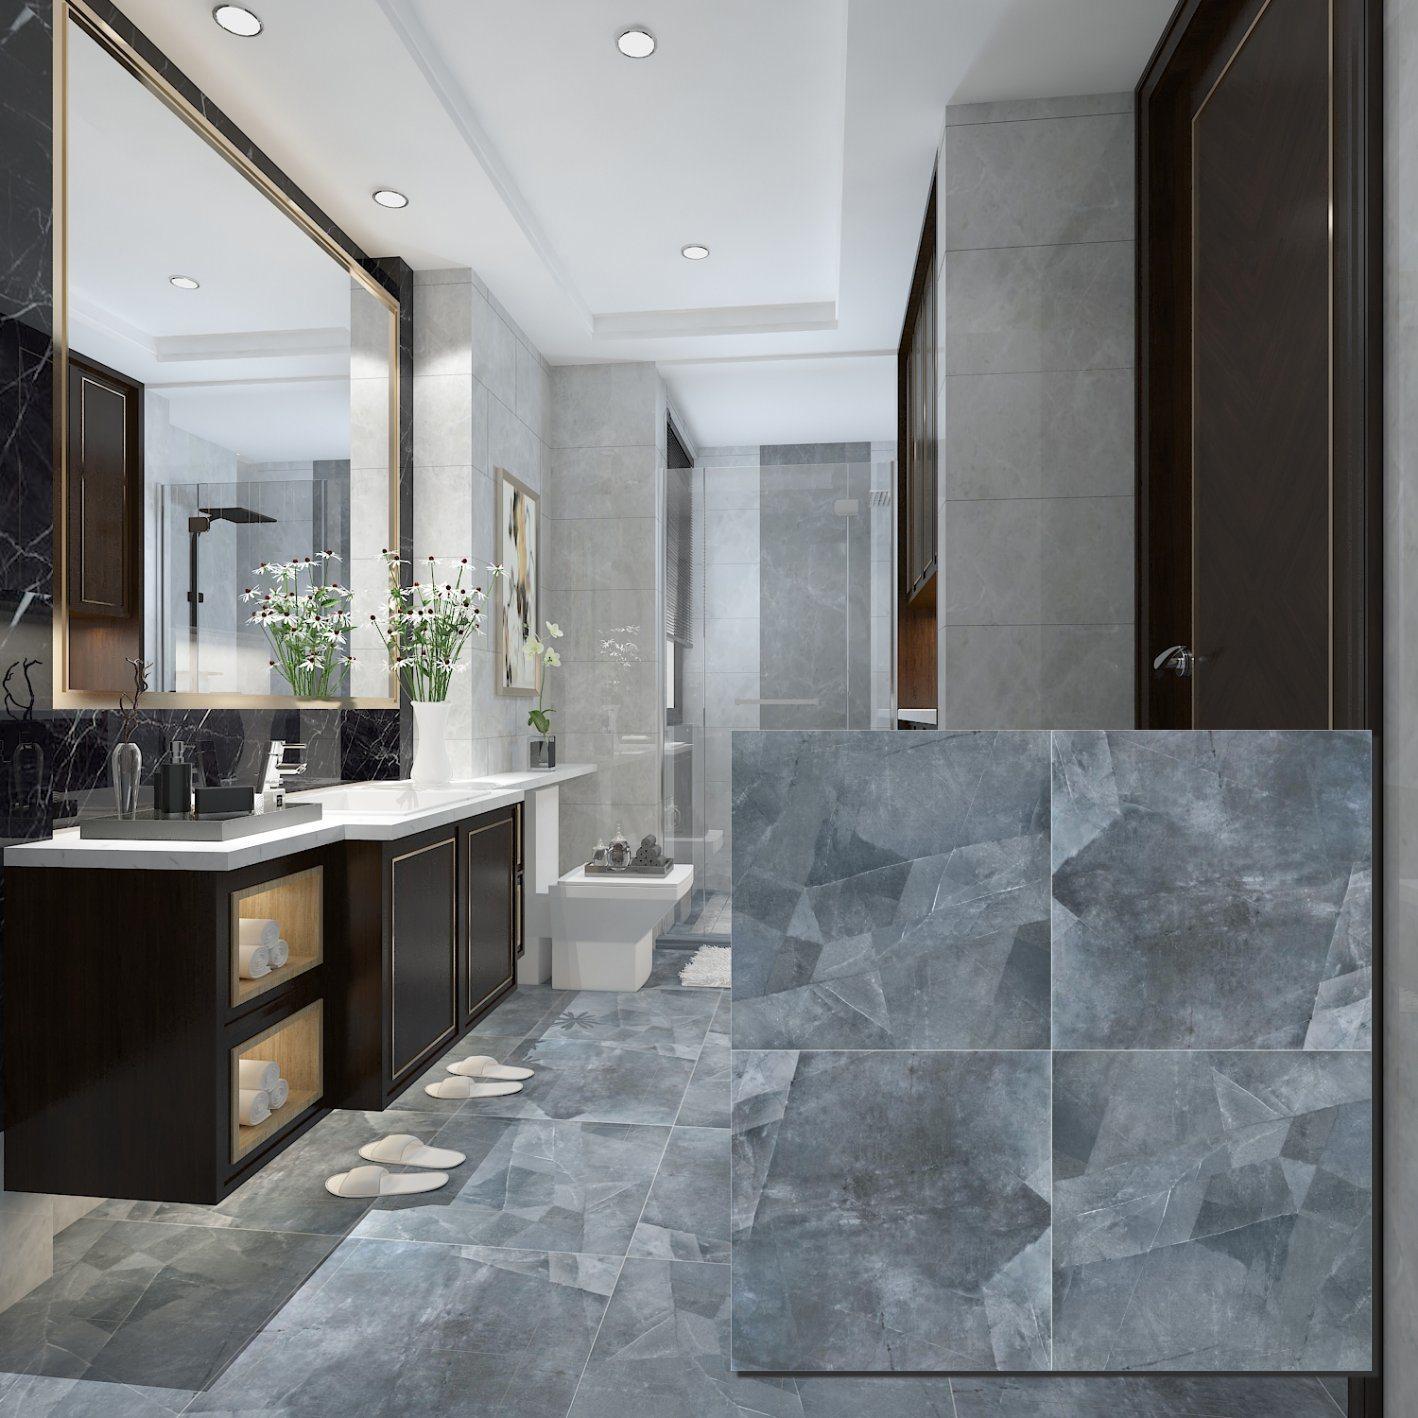 Wall Marble Bathroom Tile Designs, Porcelain Bathroom Tile Ideas